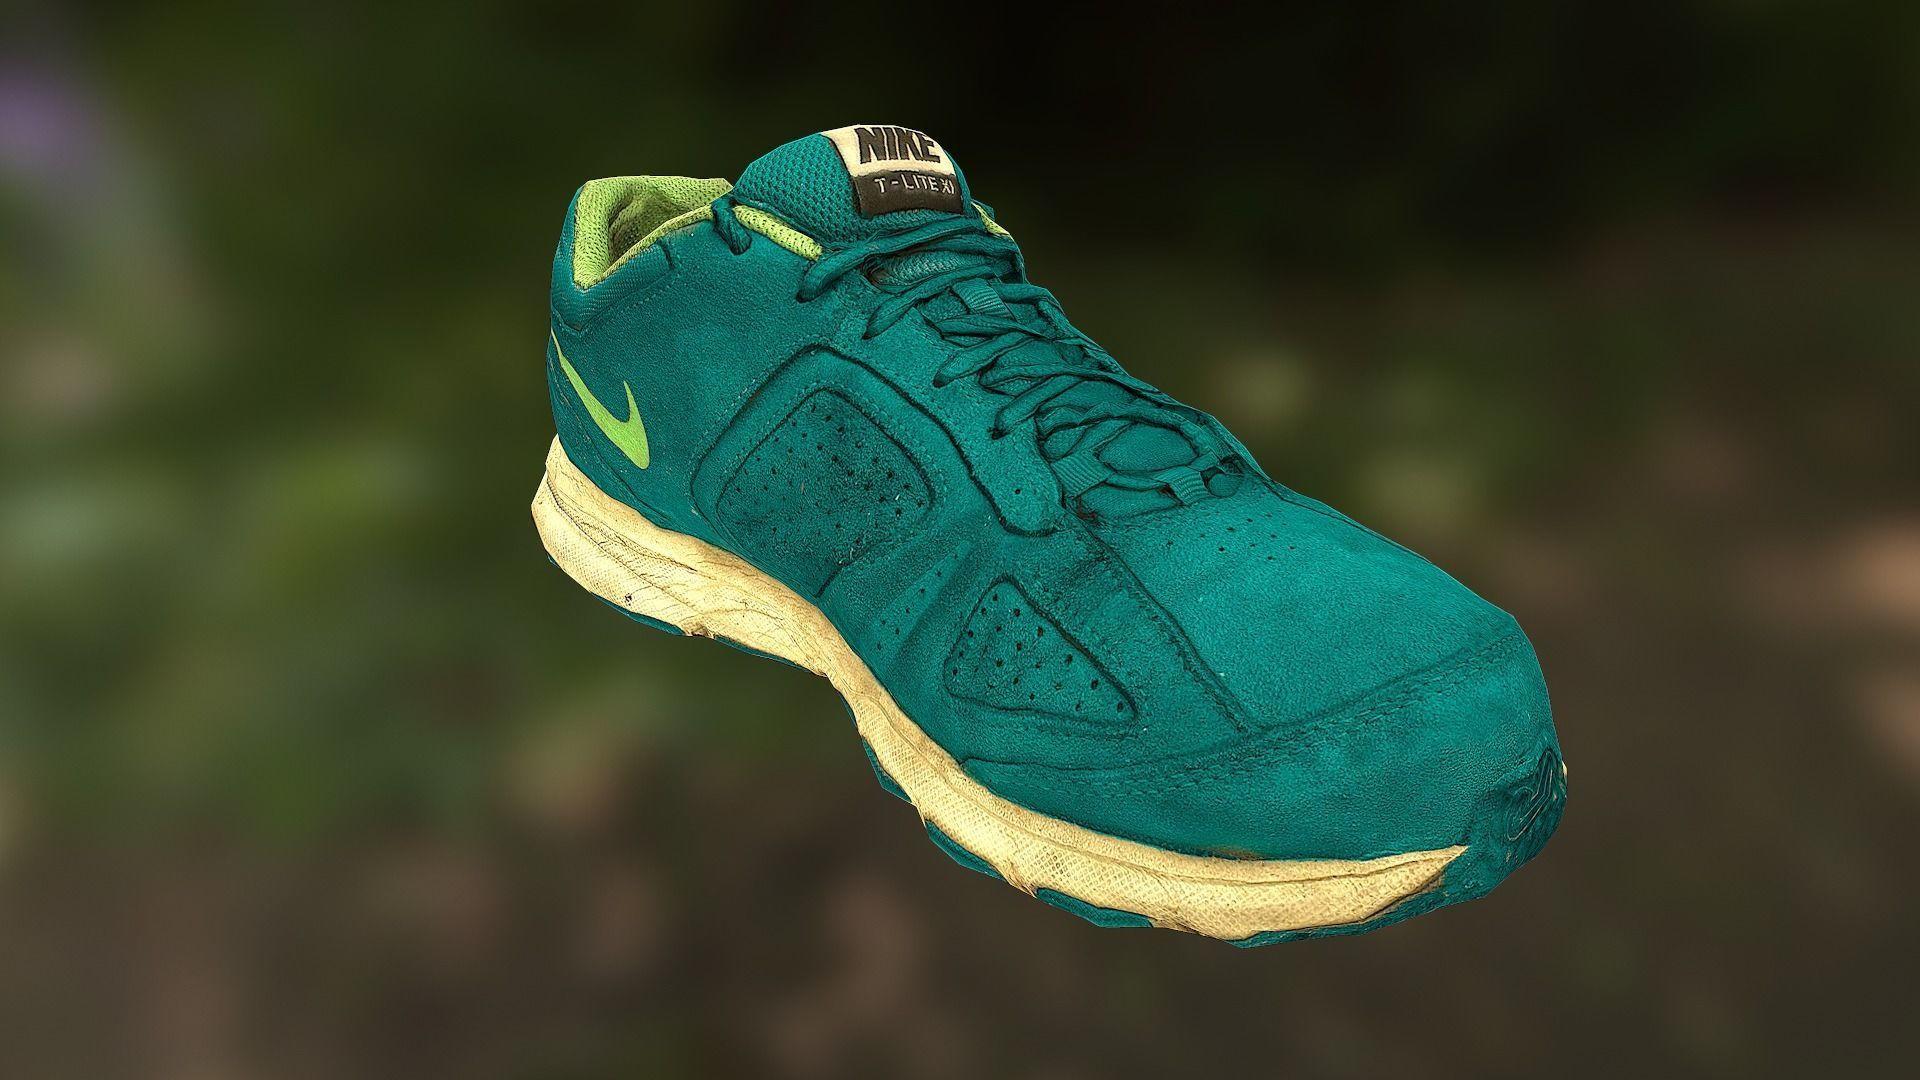 Worn Nike shoe low poly 3D model